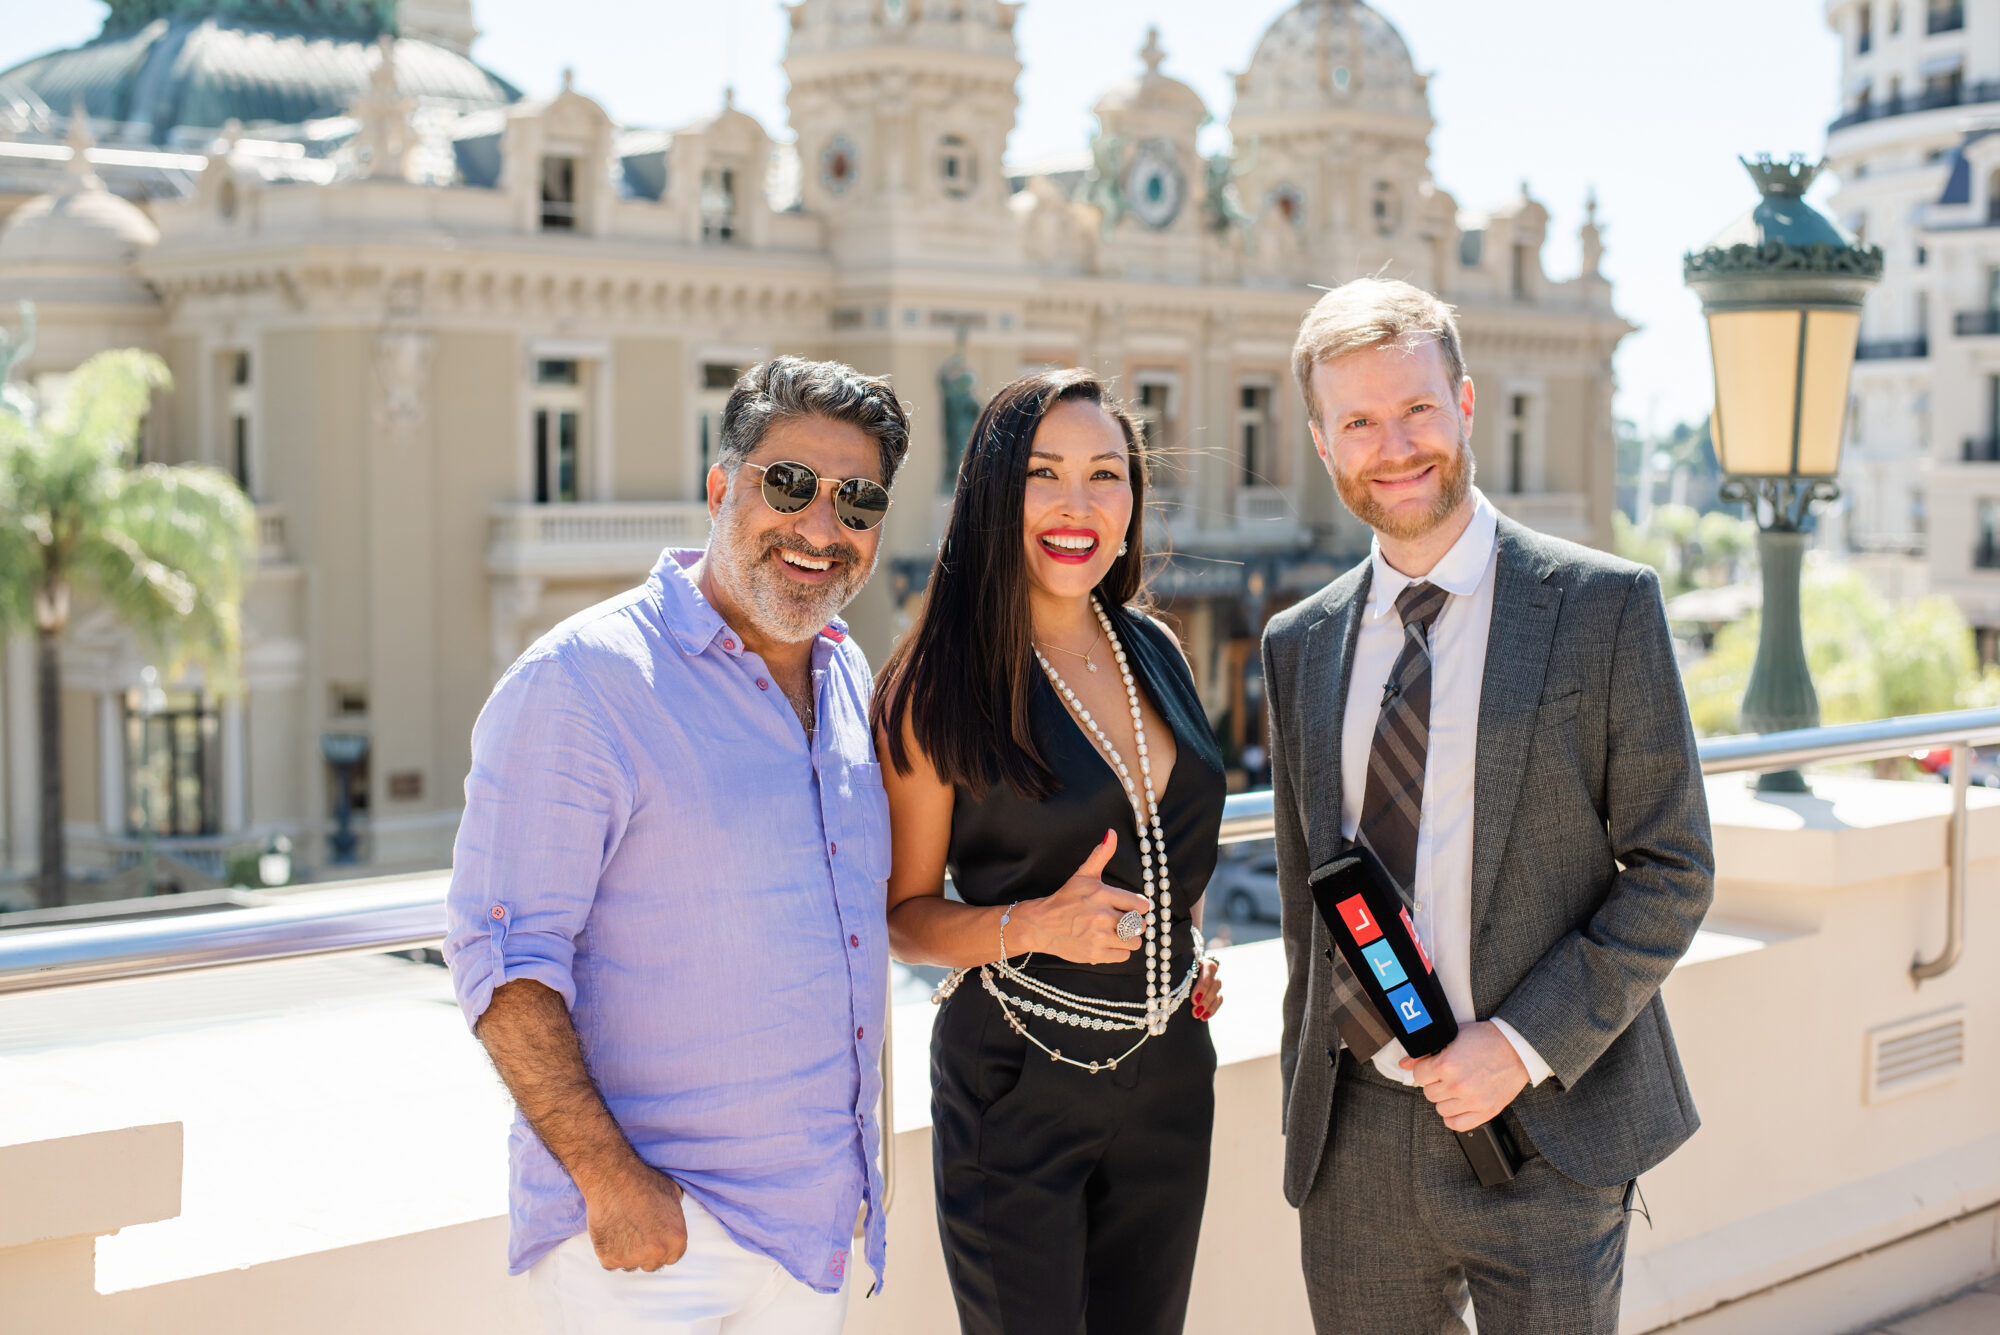 Soheil Zadeh, Gulshat Uzenbaeva, Dominique Fleckinger (RTL)